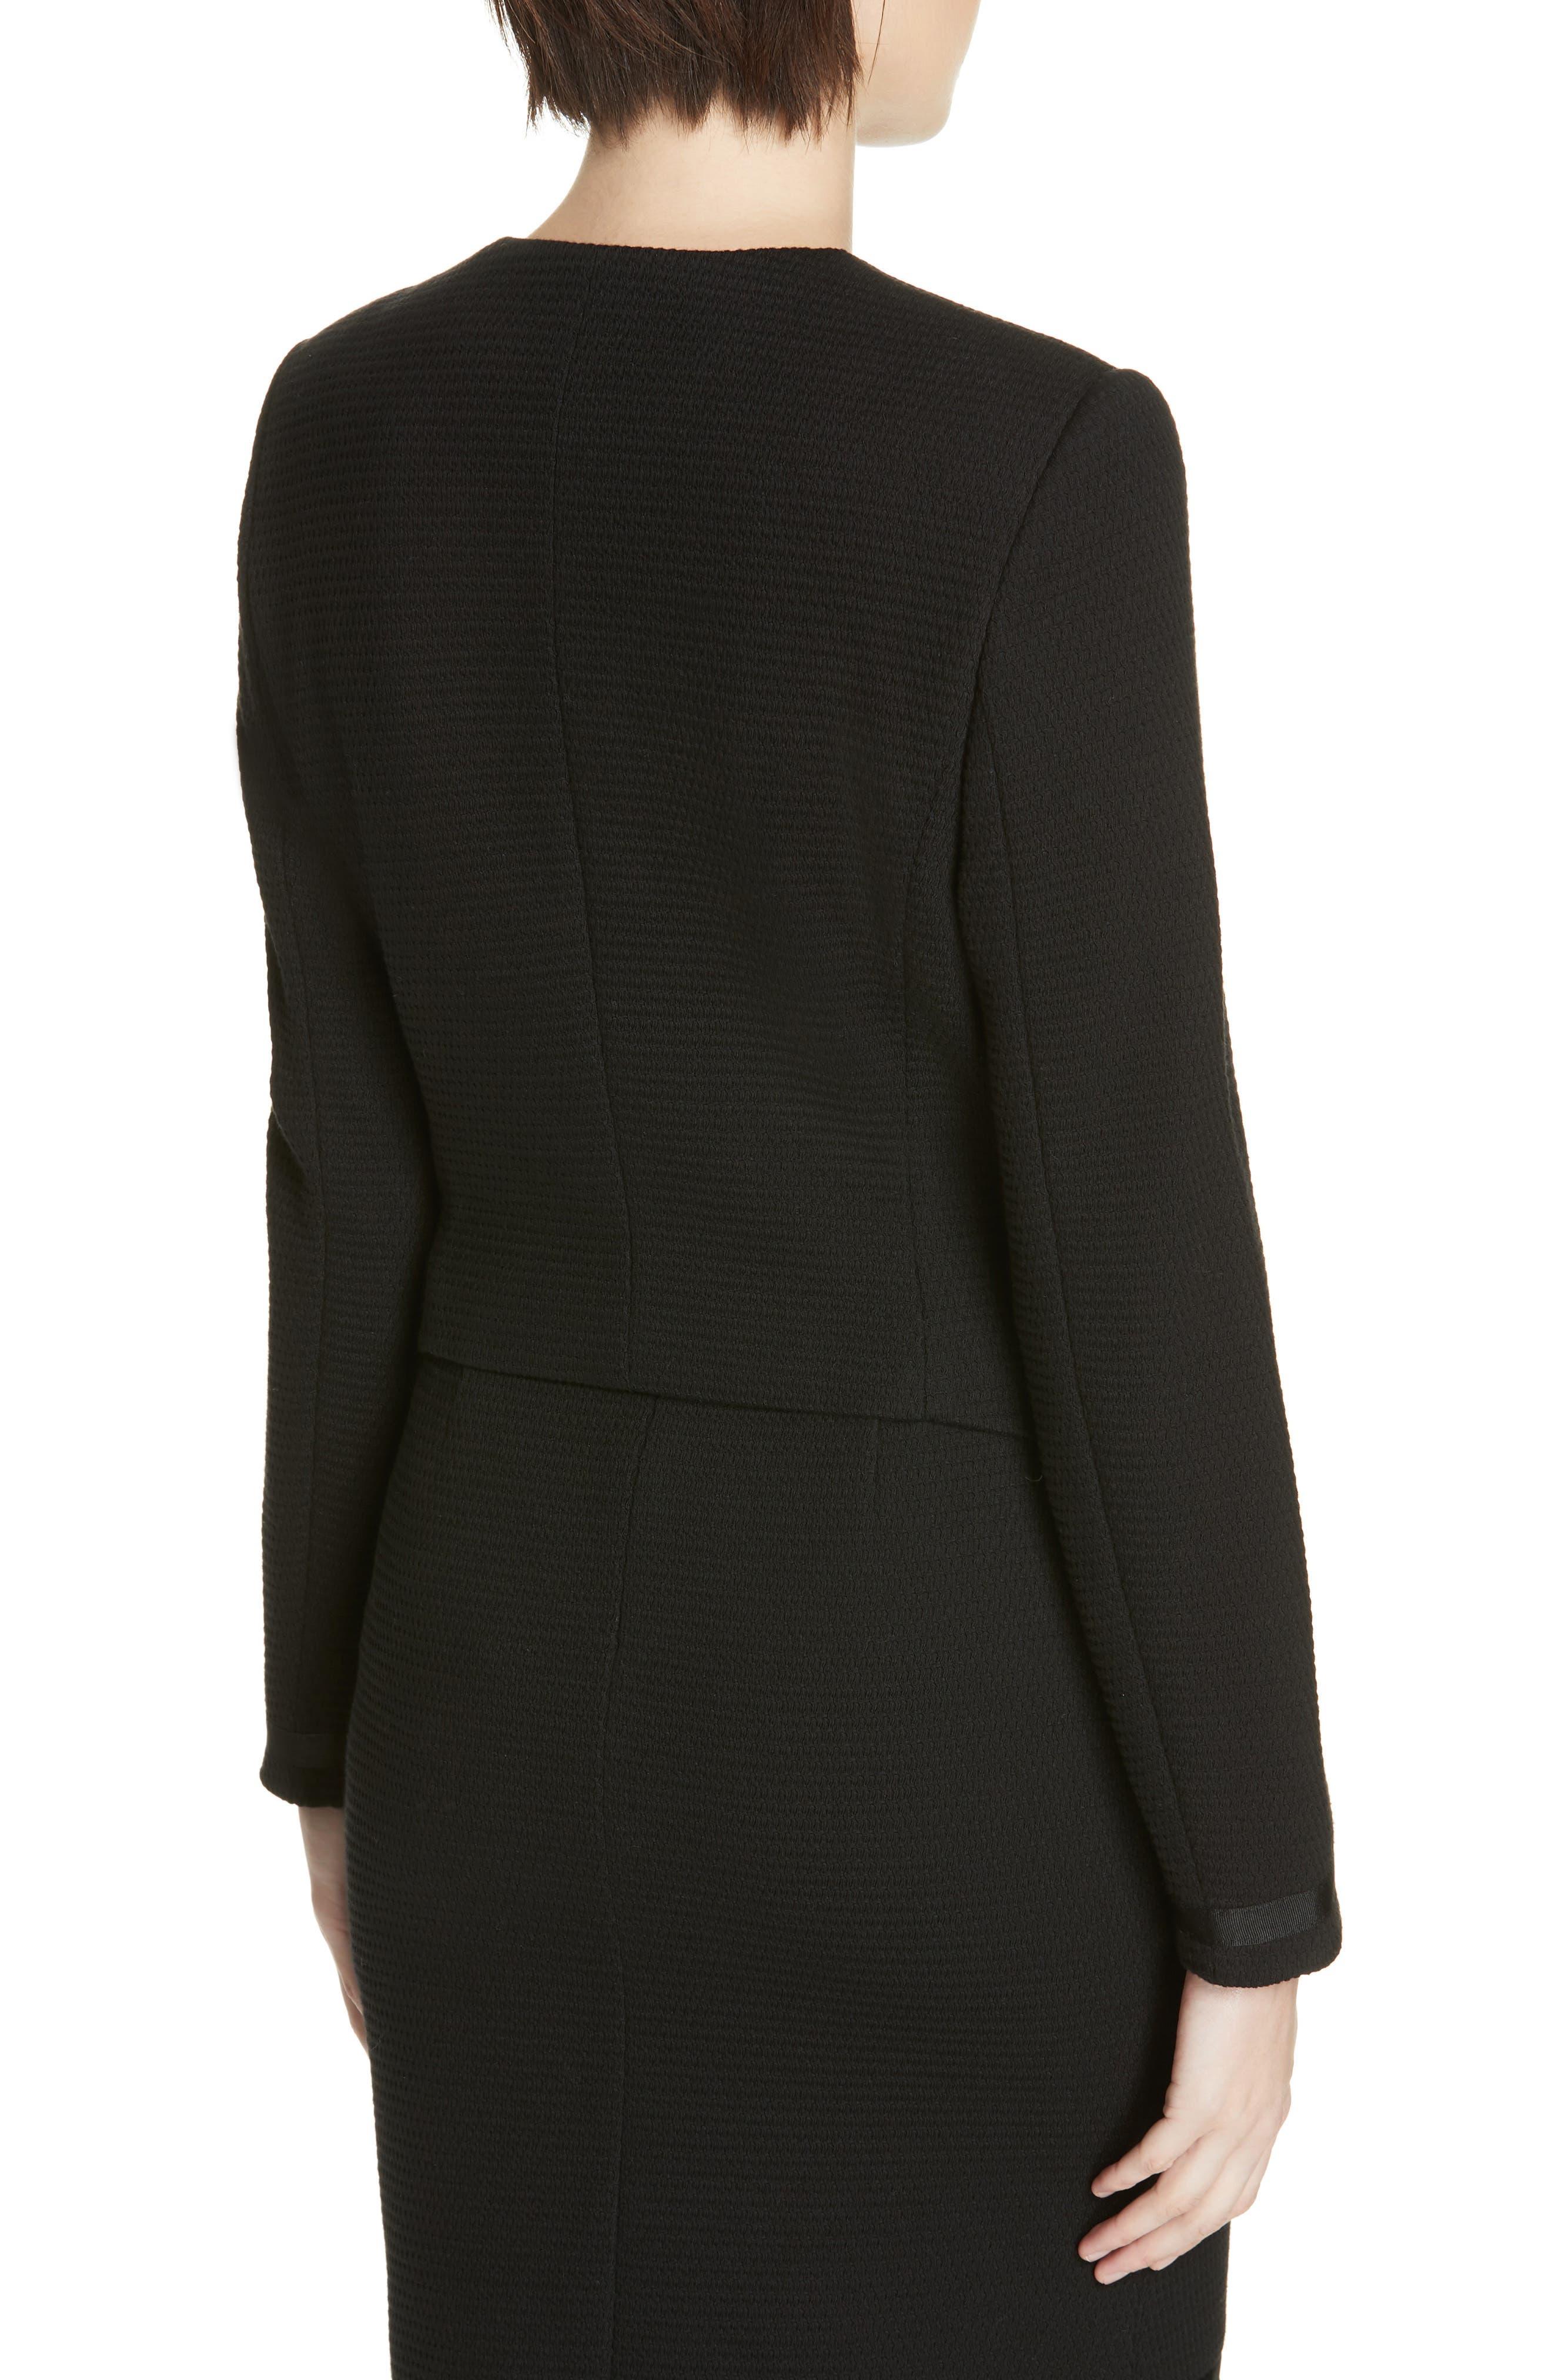 Kemio Textured Jersey Suit Jacket,                             Alternate thumbnail 2, color,                             BLACK